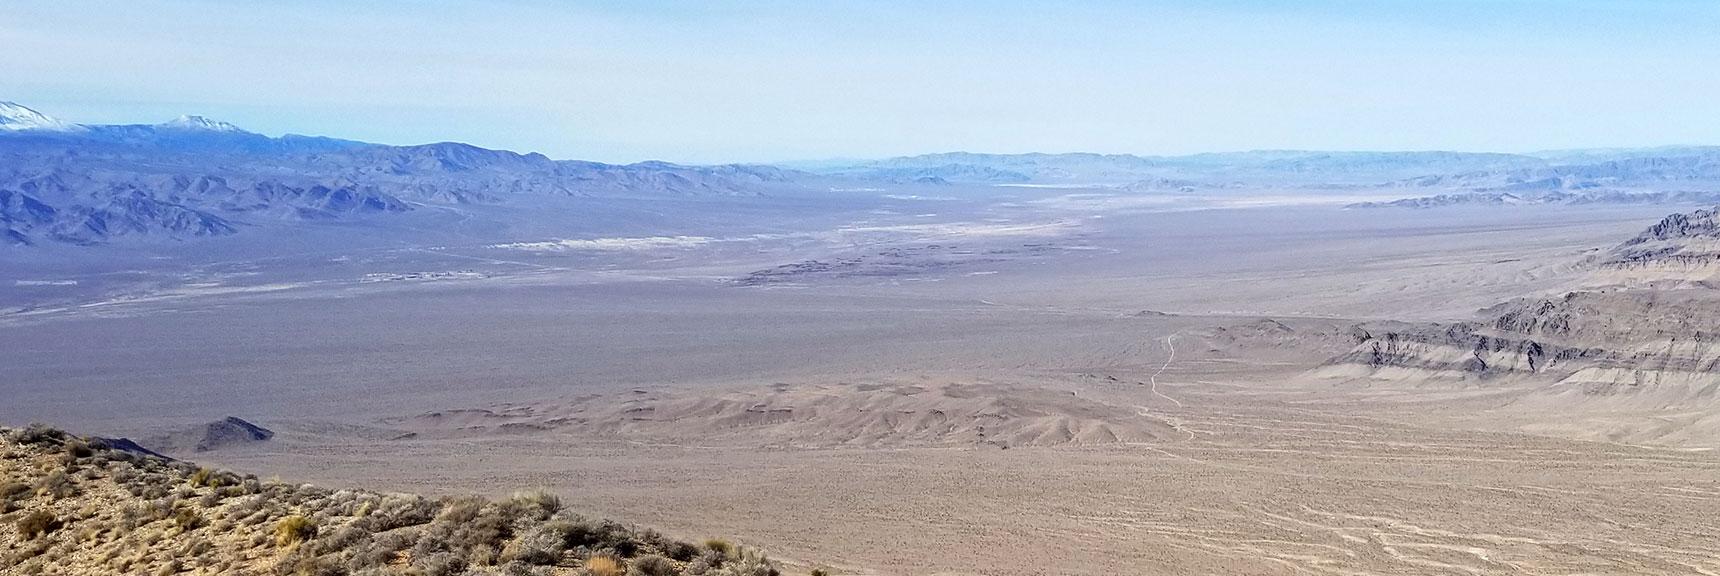 View Toward Death Valley from Gass Peak Summit, Nevada